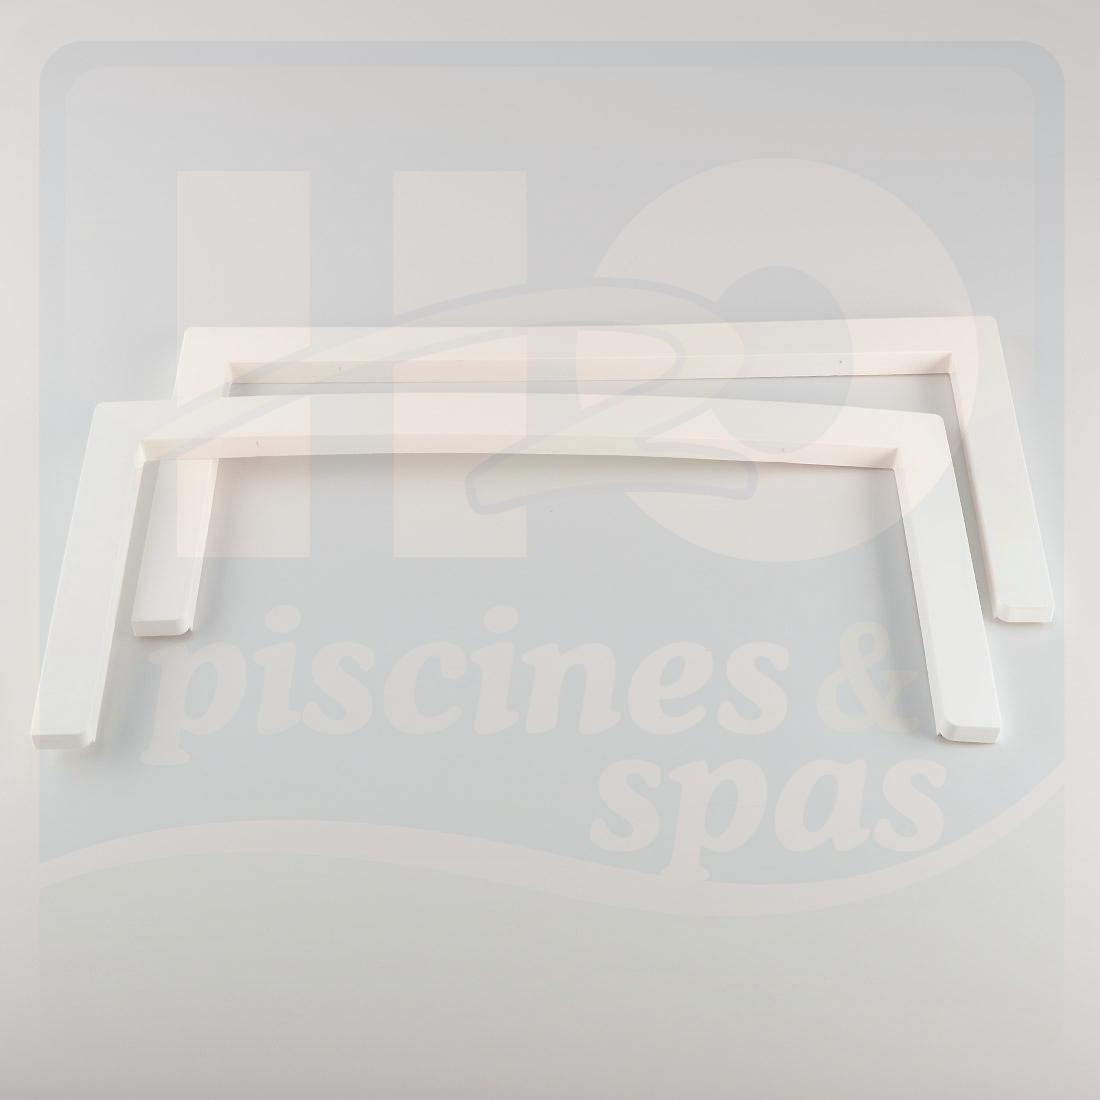 Cache bride de rechange de skimmer miroir aquareva blanc for Piscine skimmer miroir